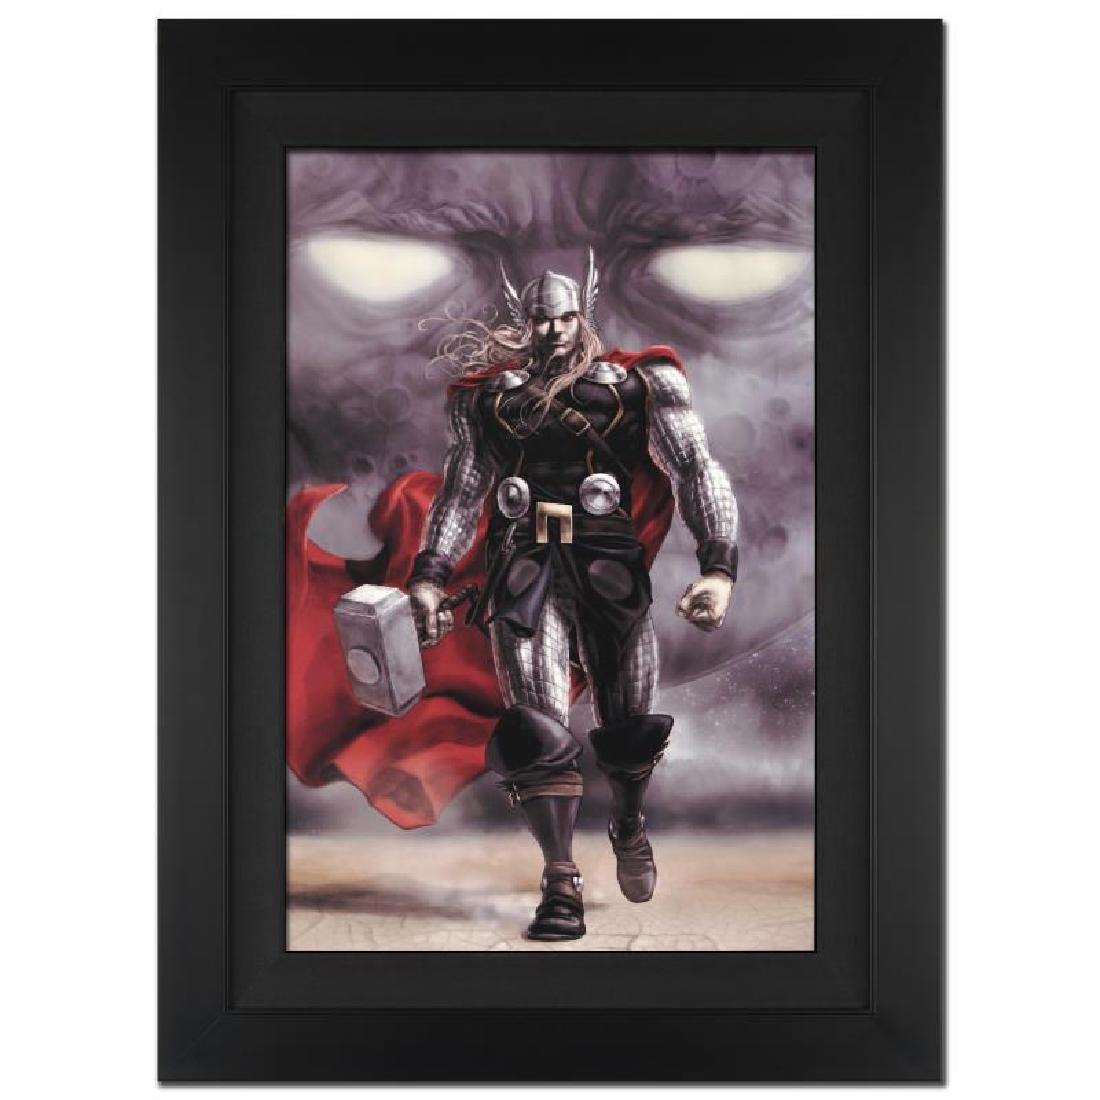 Astonishing Thor #5 by Stan Lee - Marvel Comics